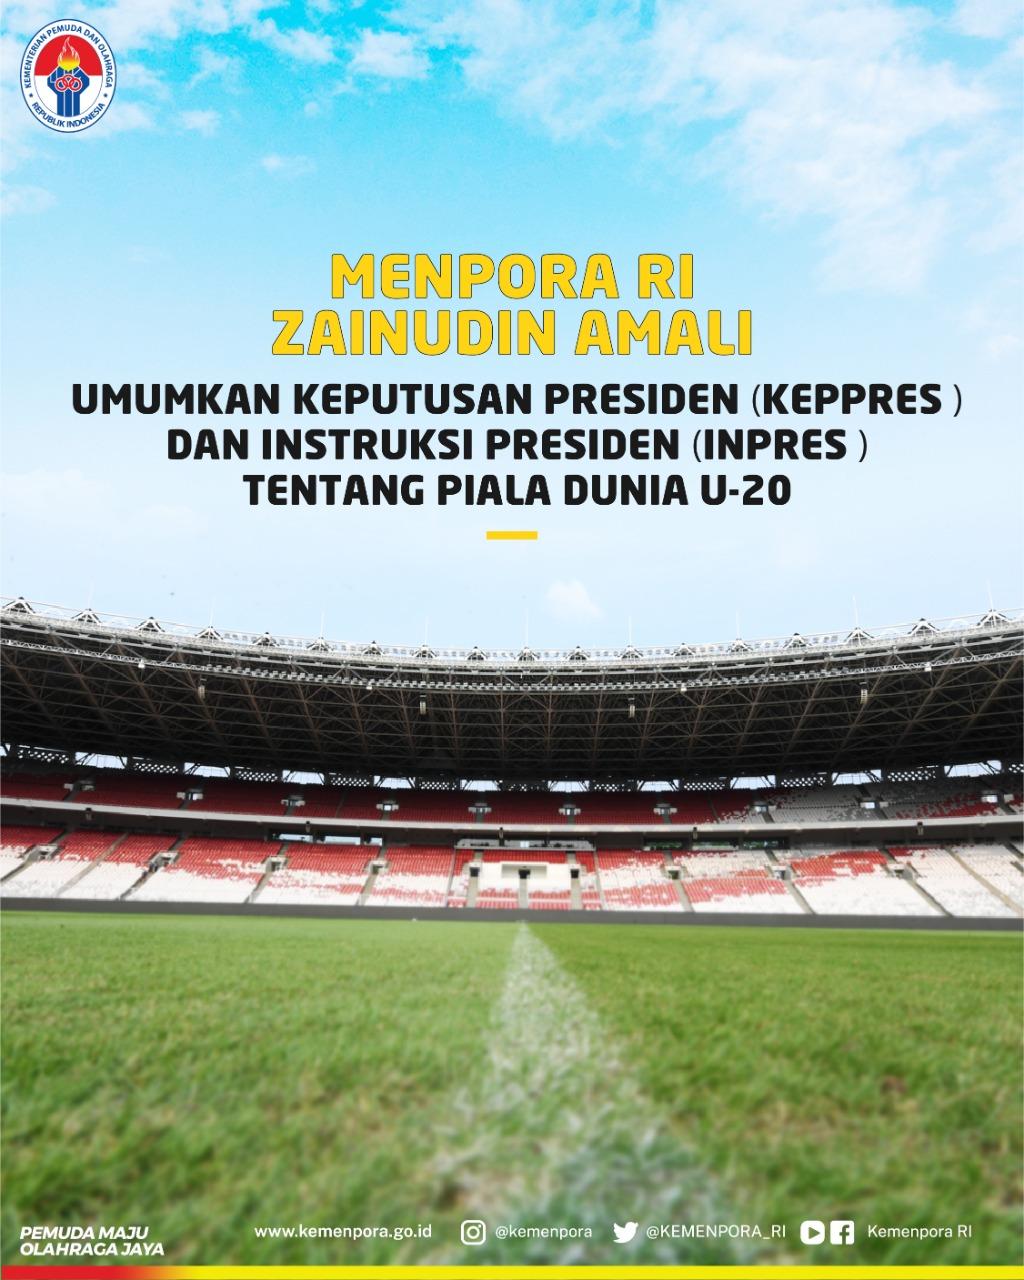 Menpora RI Zainudin Amali umumkan Keppres) dan Inpres tentang Piala Dunia U-20